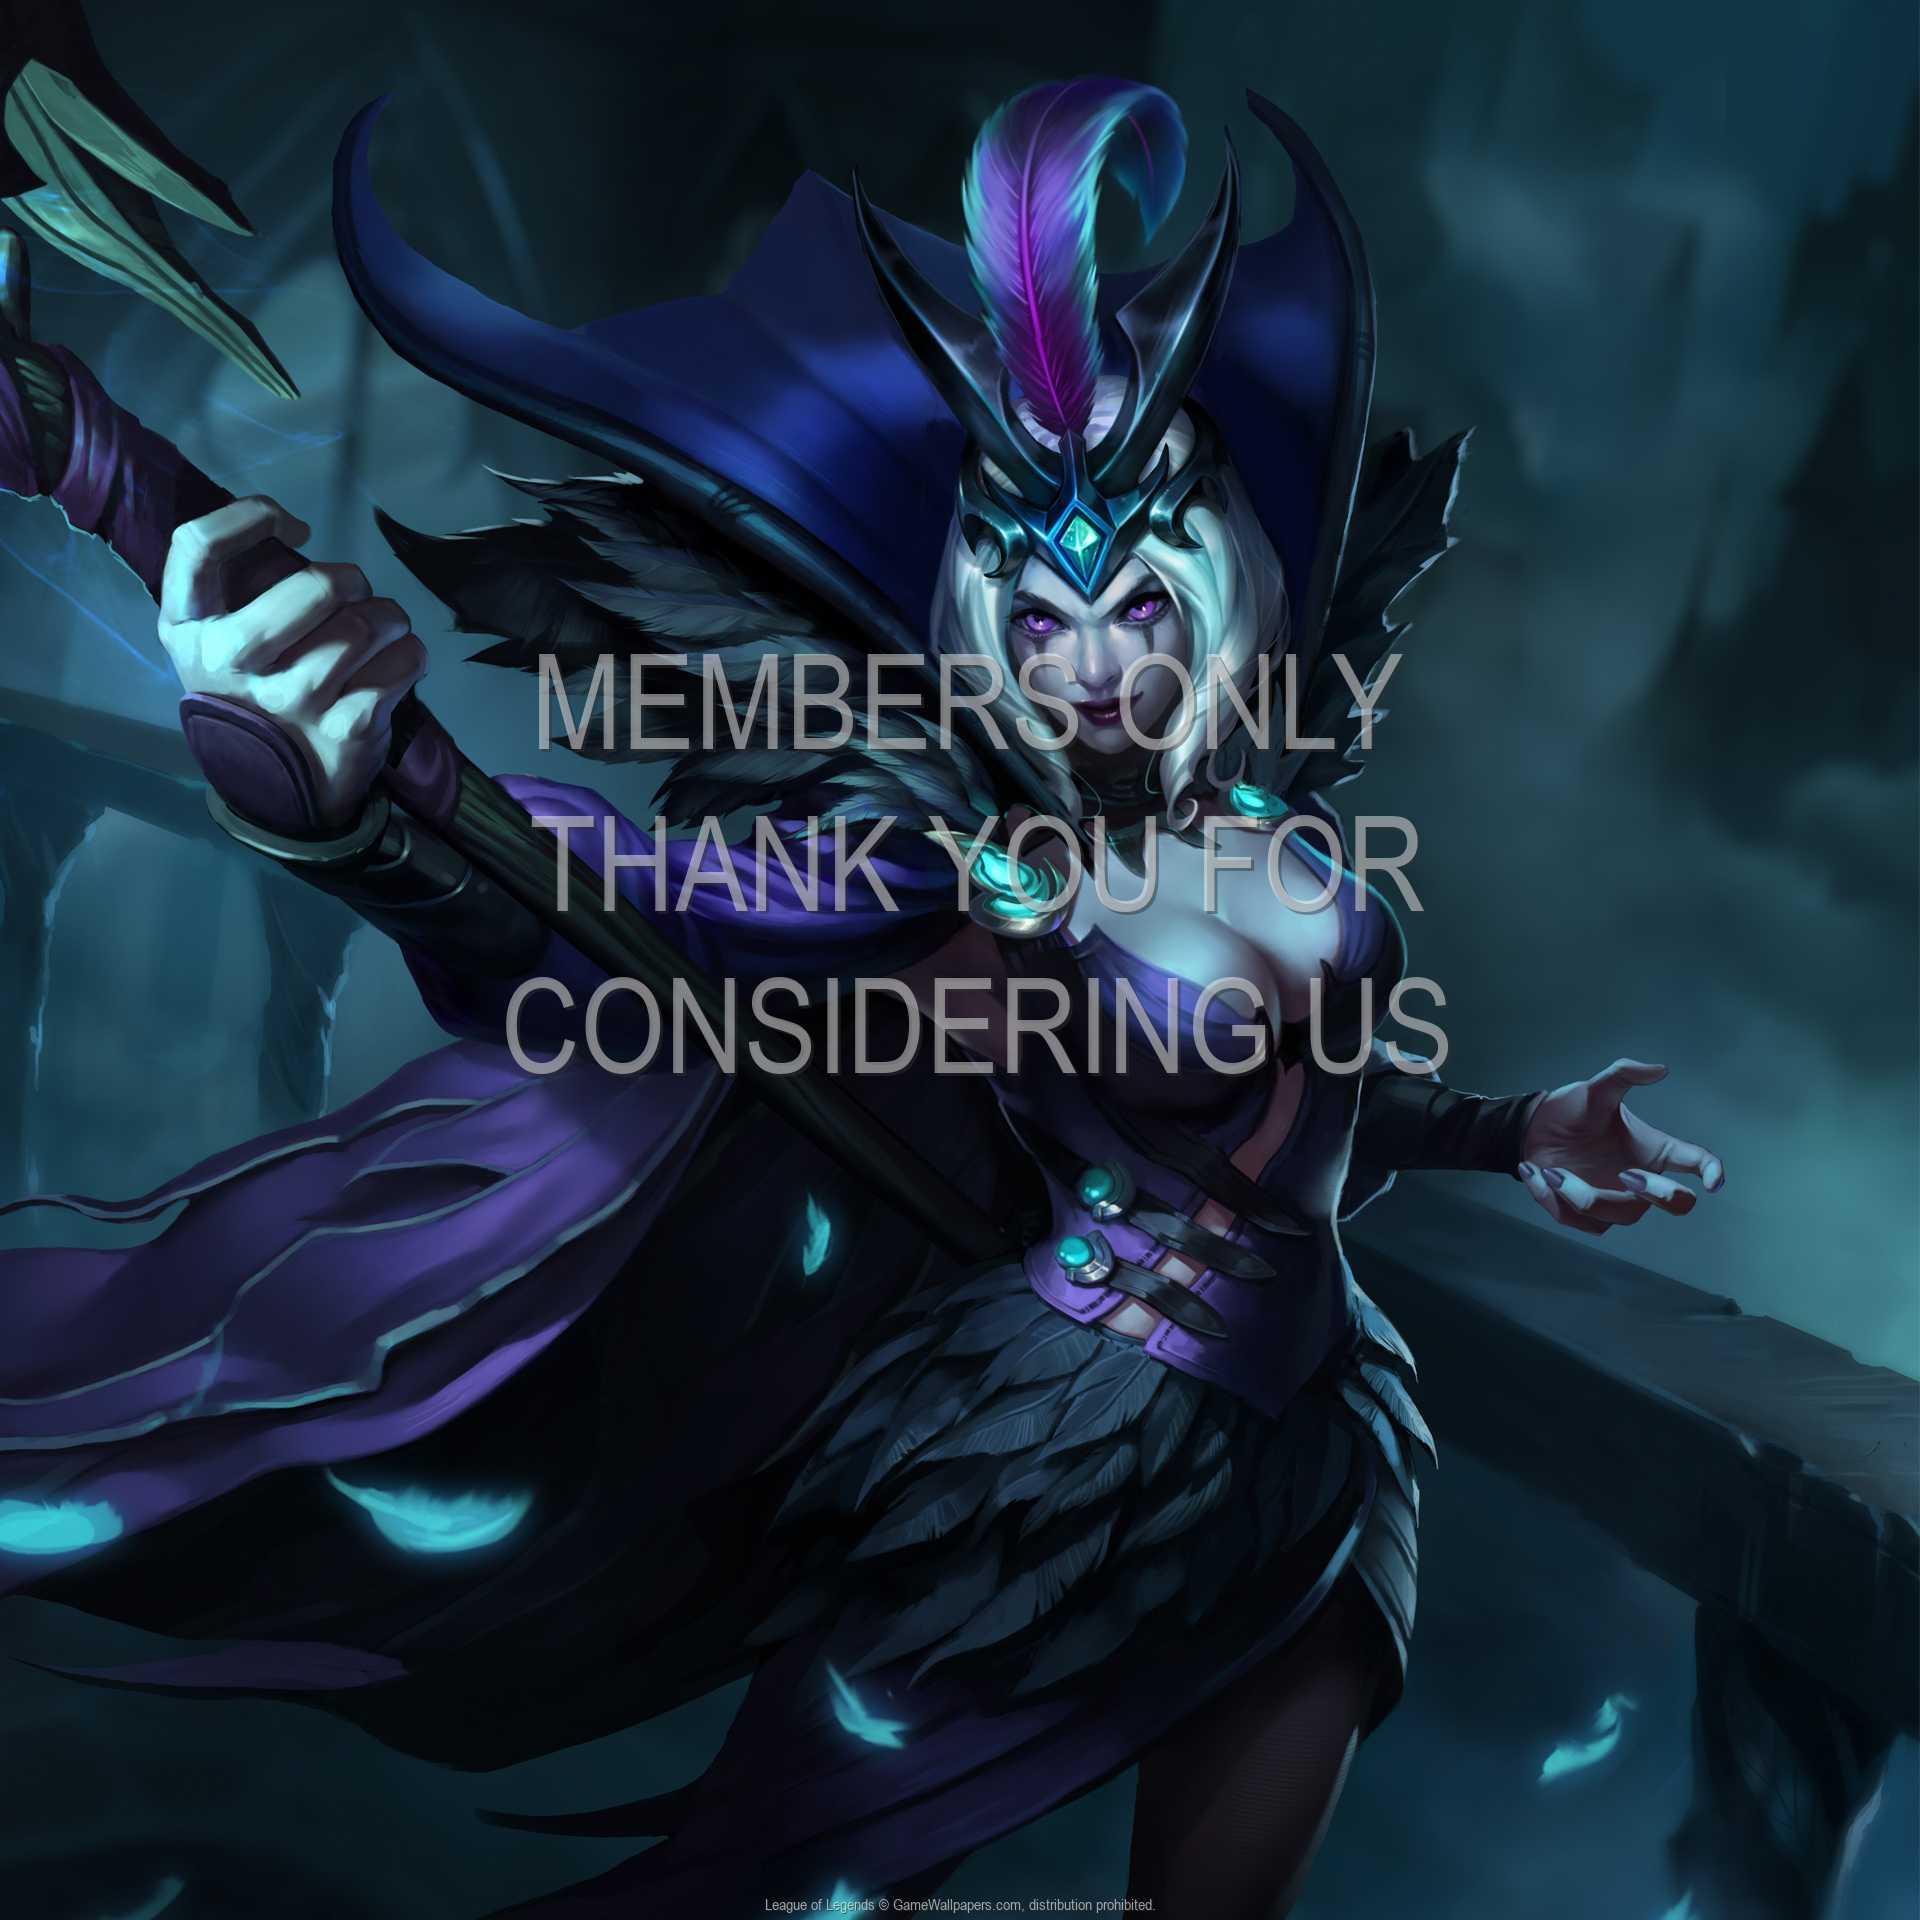 League of Legends 1080p Horizontal Handy Hintergrundbild 25